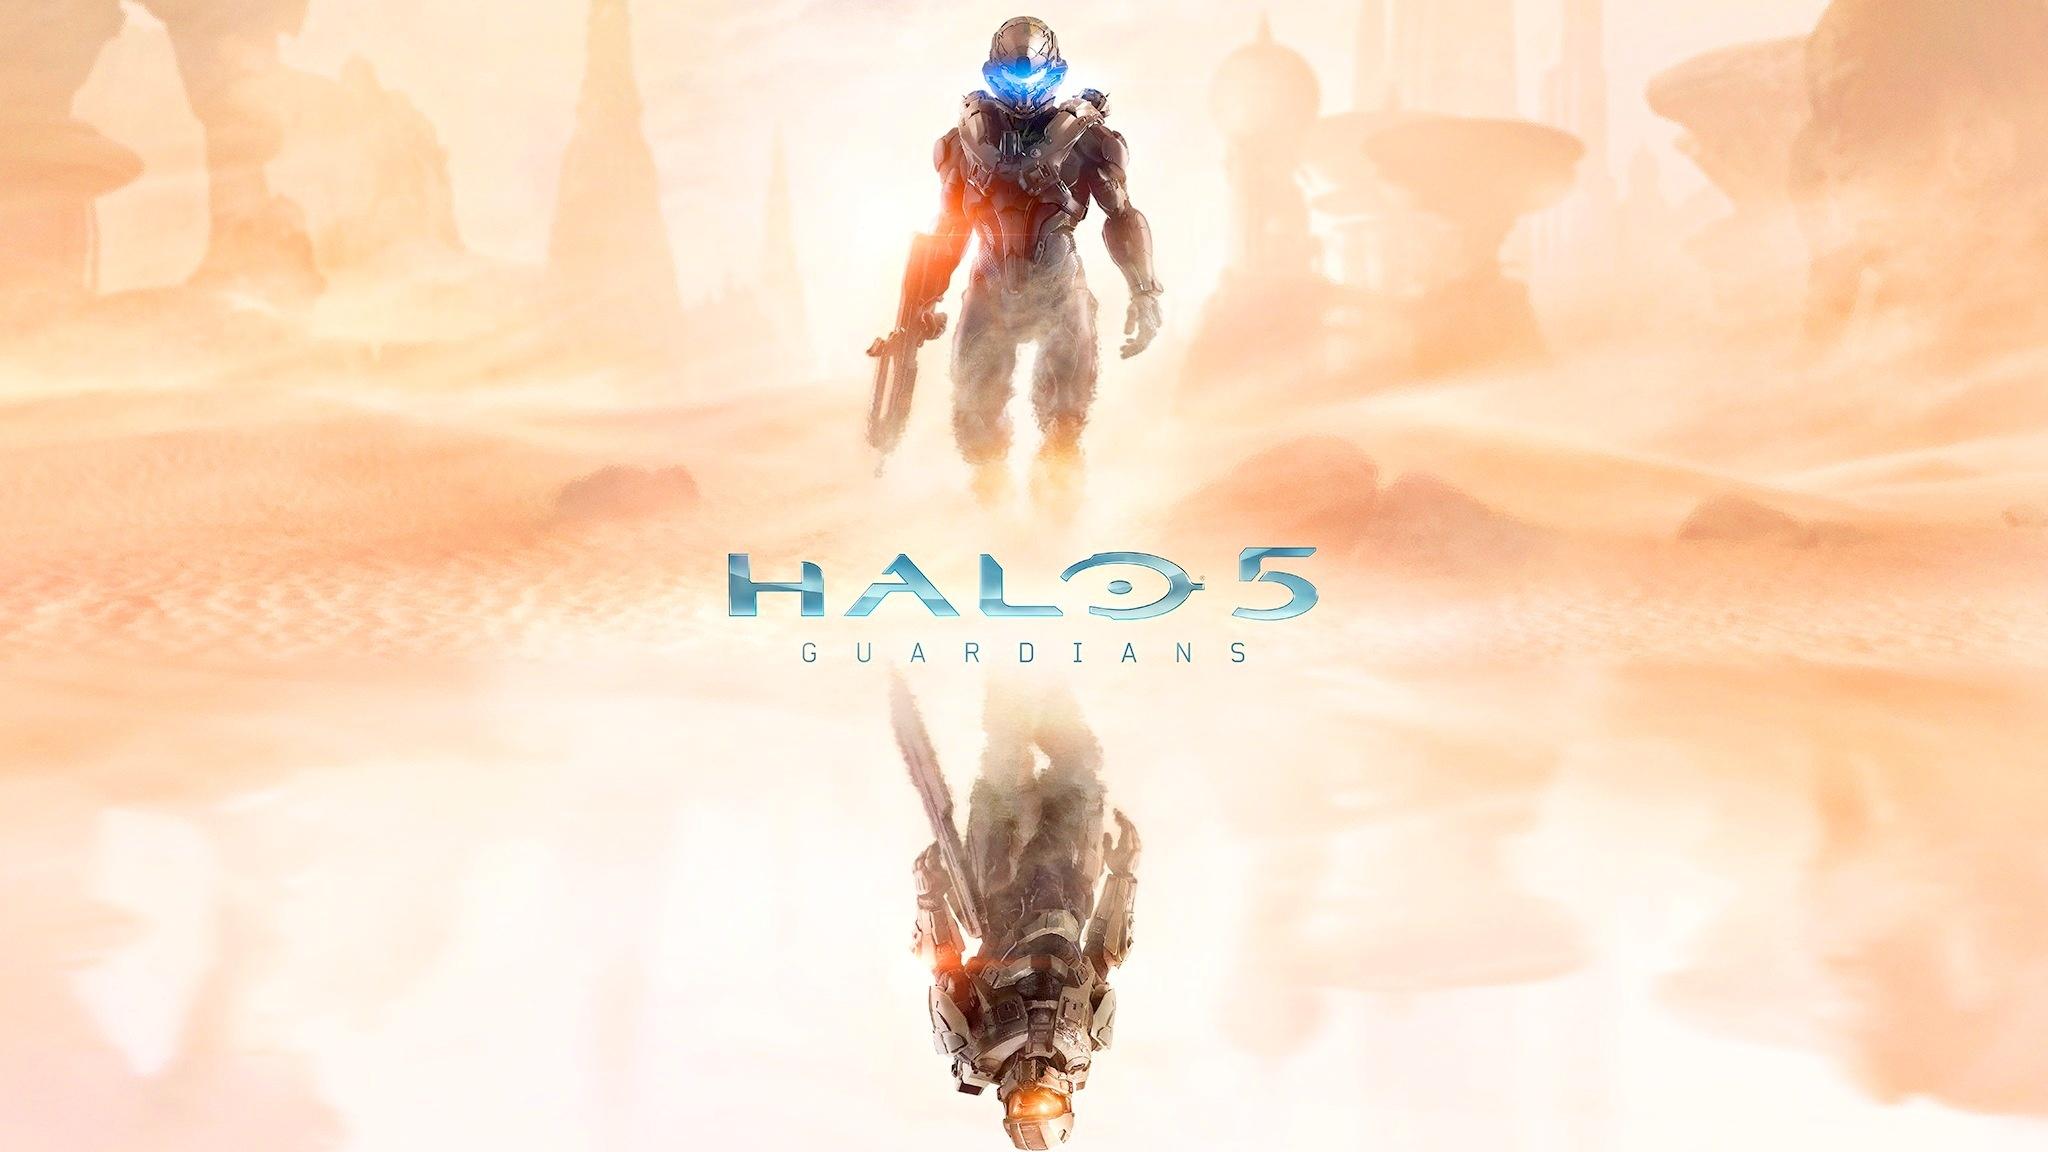 Halo 5 Guardians 2015 2048 x 1152 Download Close 2048x1152